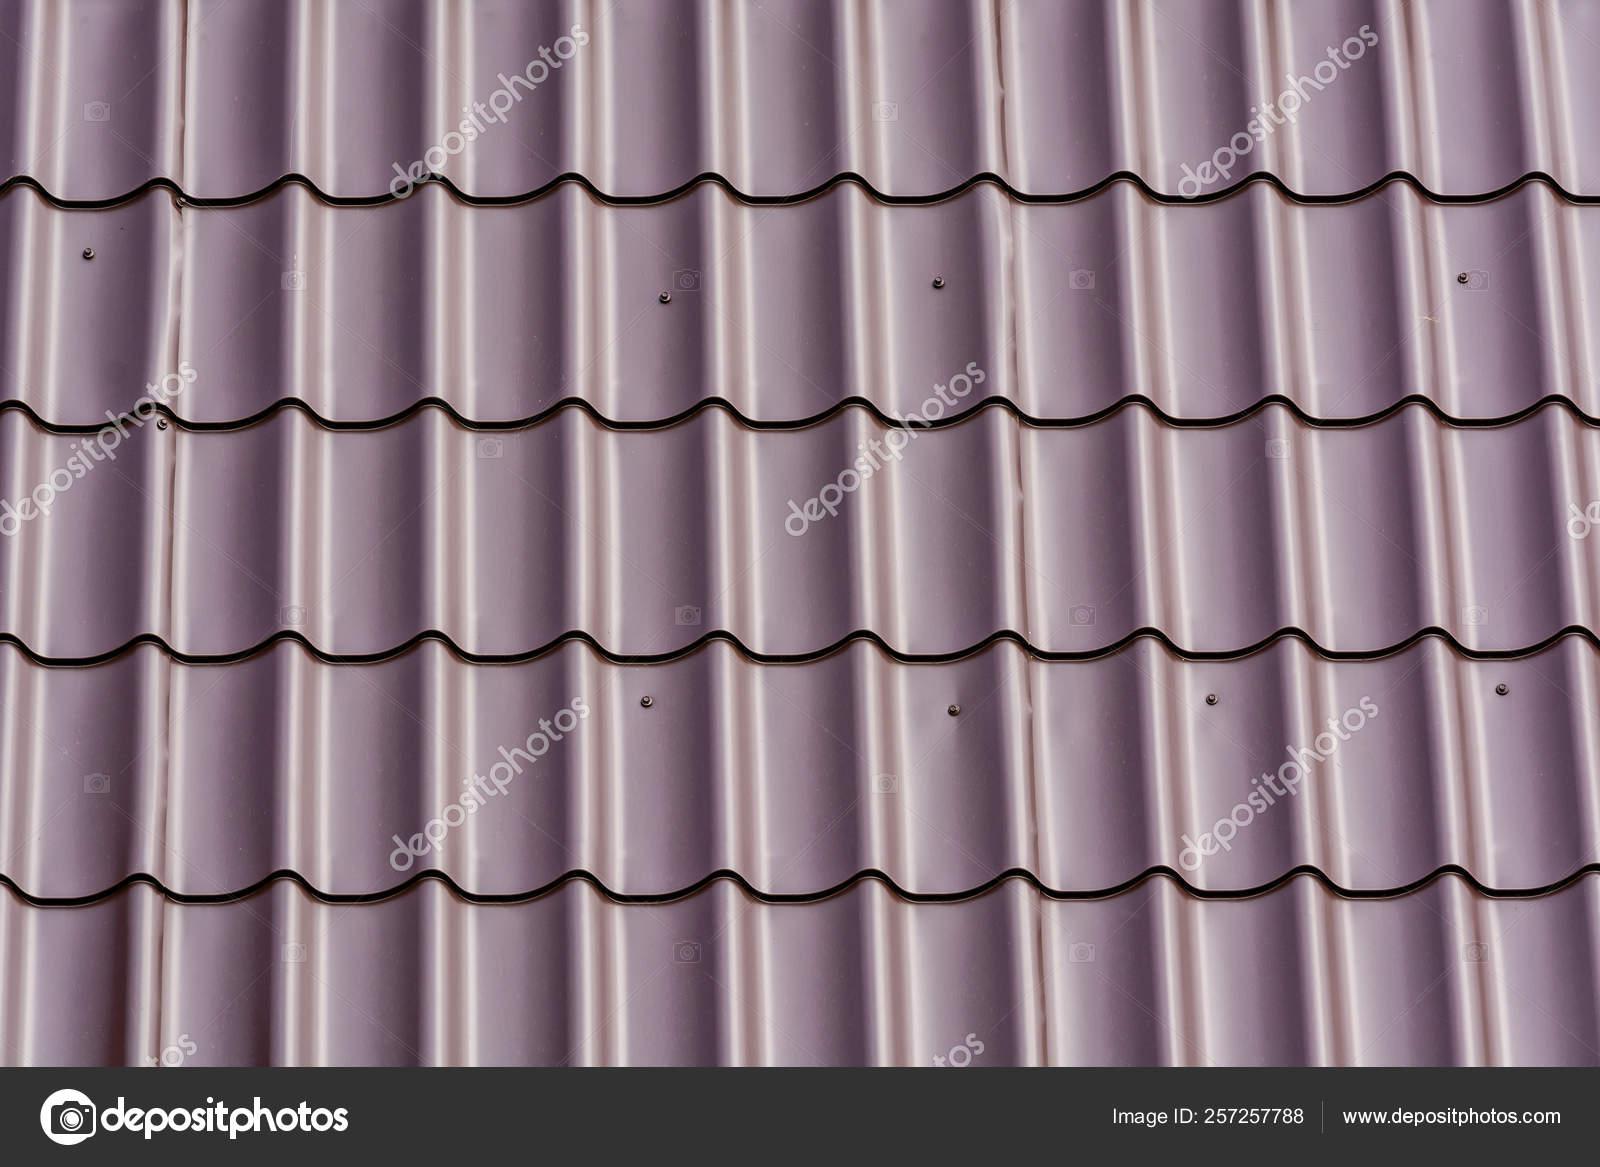 baldosas metal para techo fotografia de stock c tagwaran 257257788 depositphotos